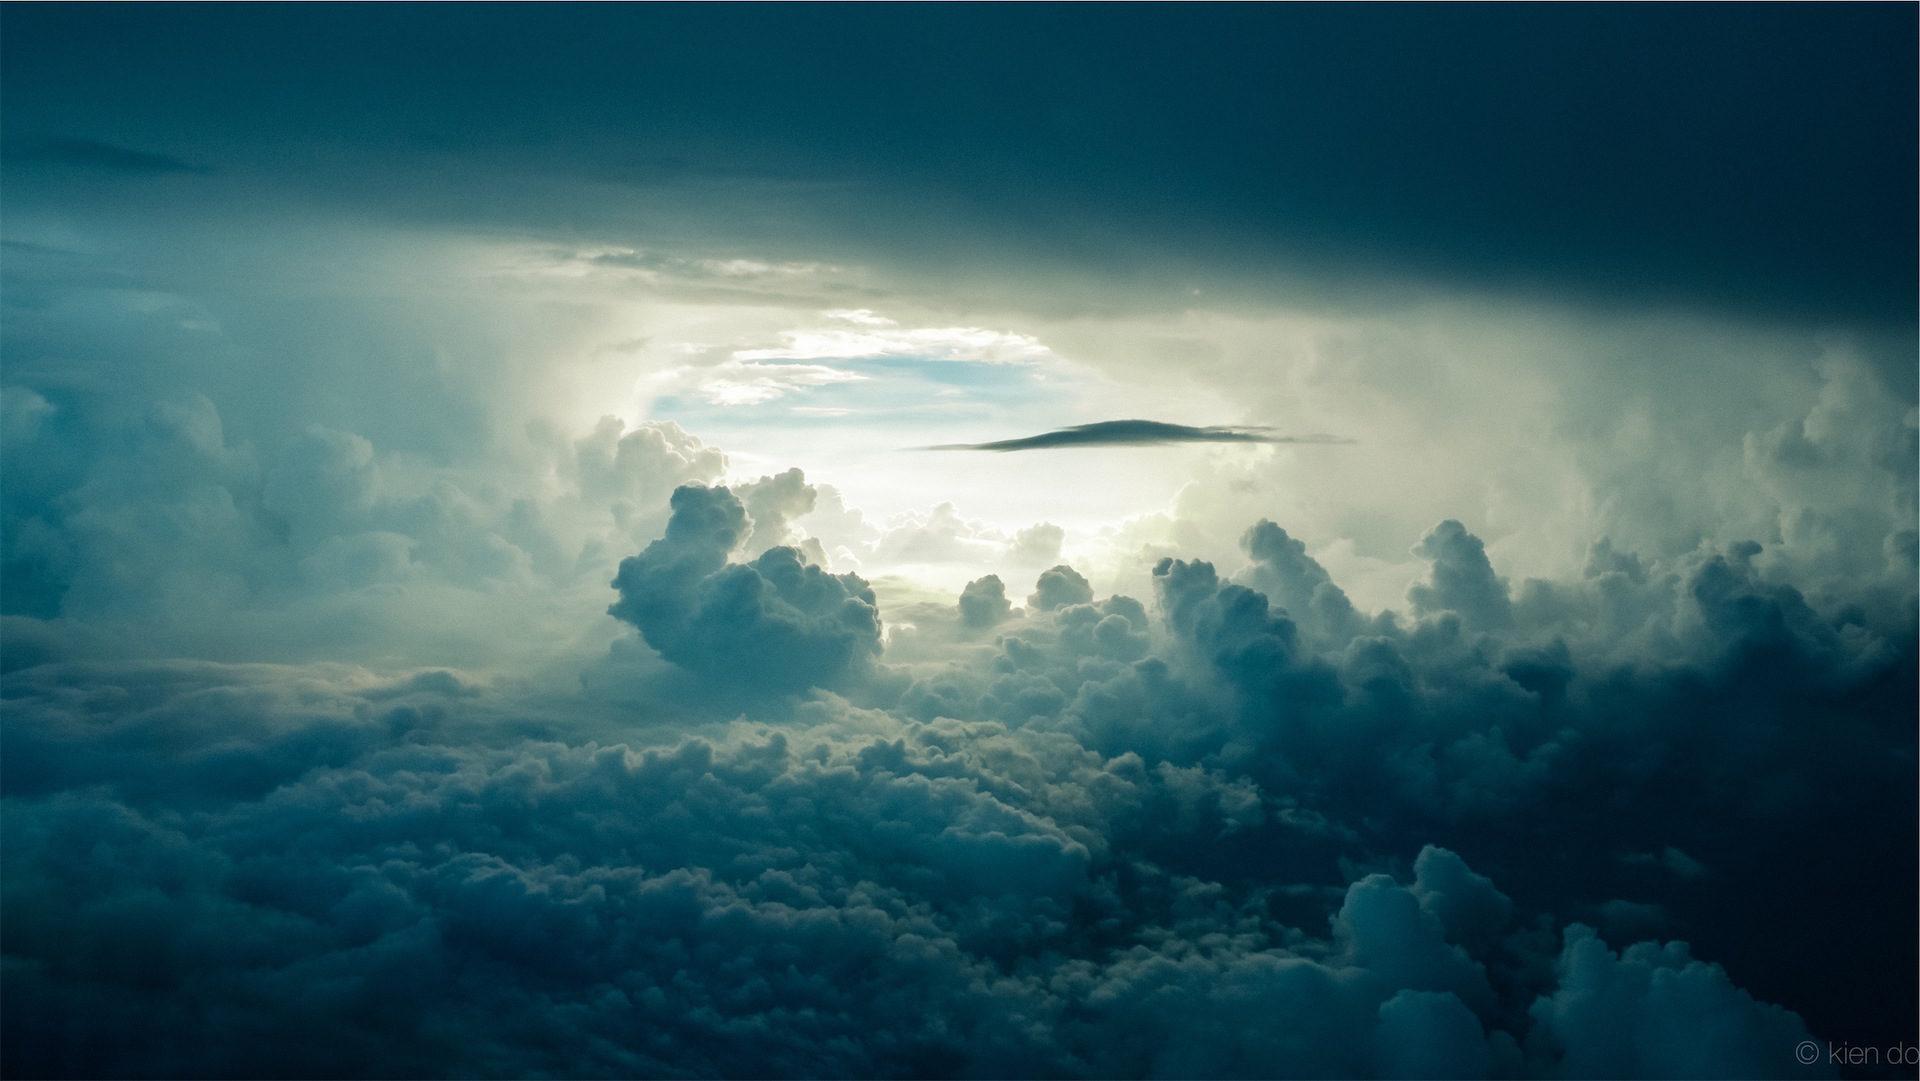 Wolken, Himmel, Formen, Natürlich, Licht - Wallpaper HD - Prof.-falken.com